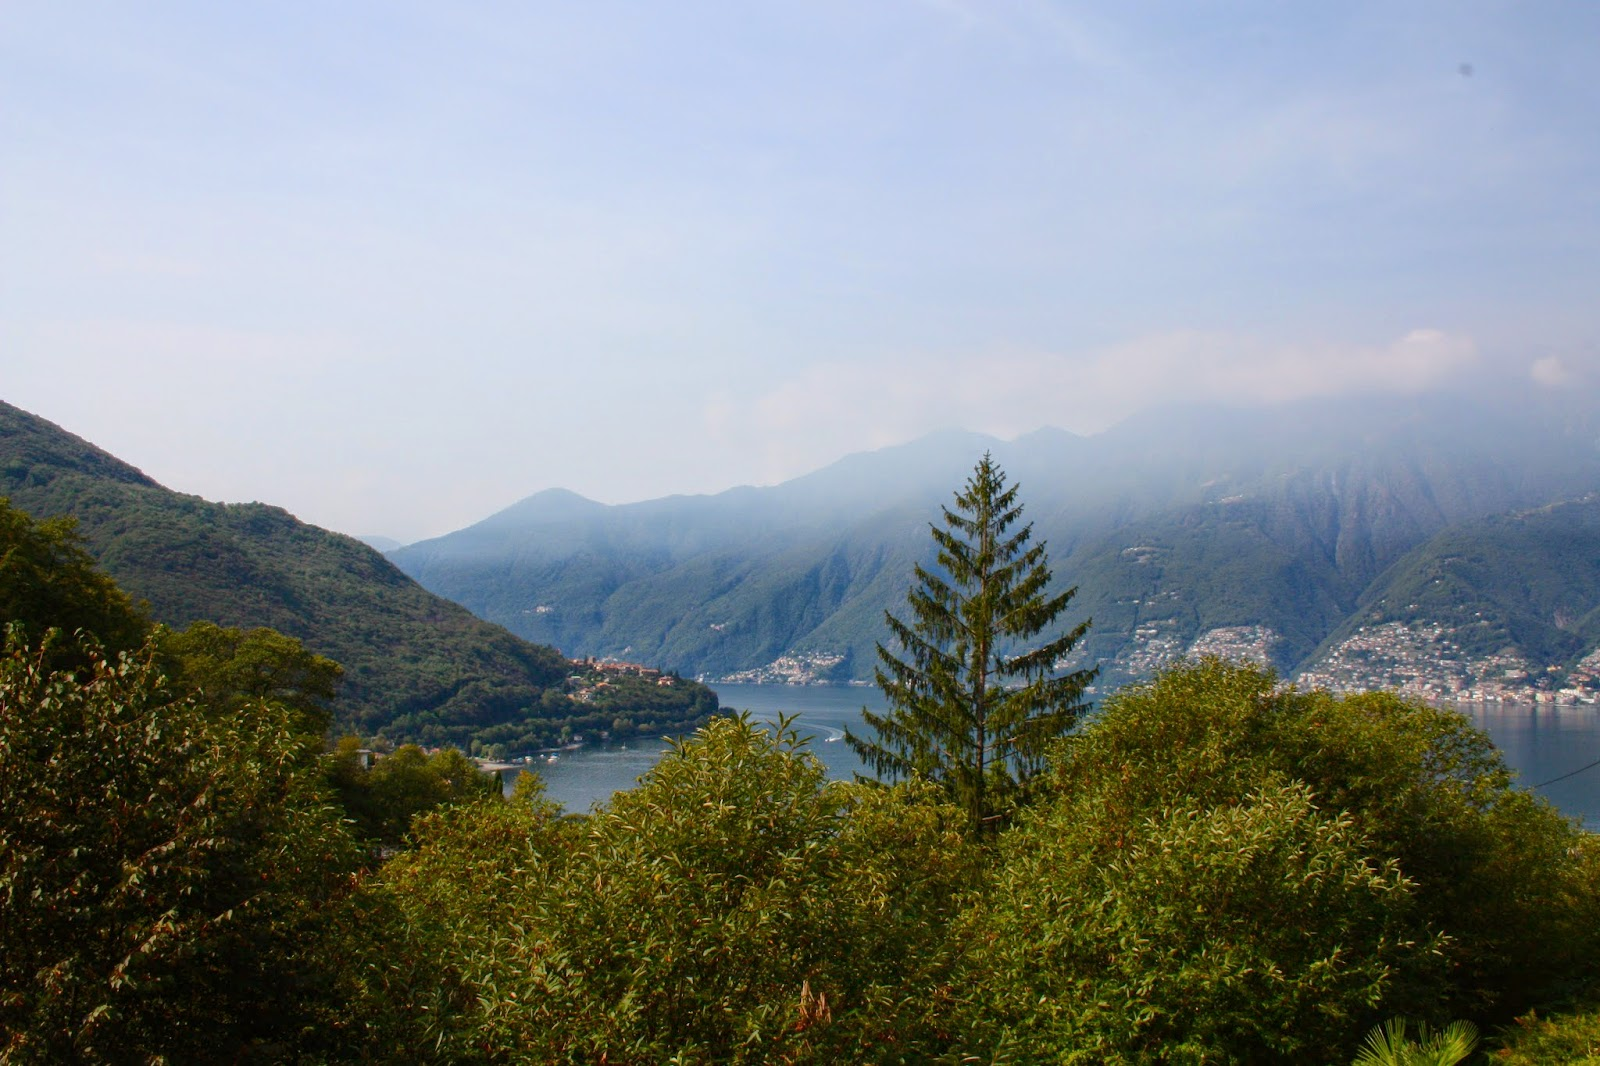 Berge Urlaub Fernreise Europa Ferien 2014 Tessin Italien Schweiz Mittelmeer See Reise